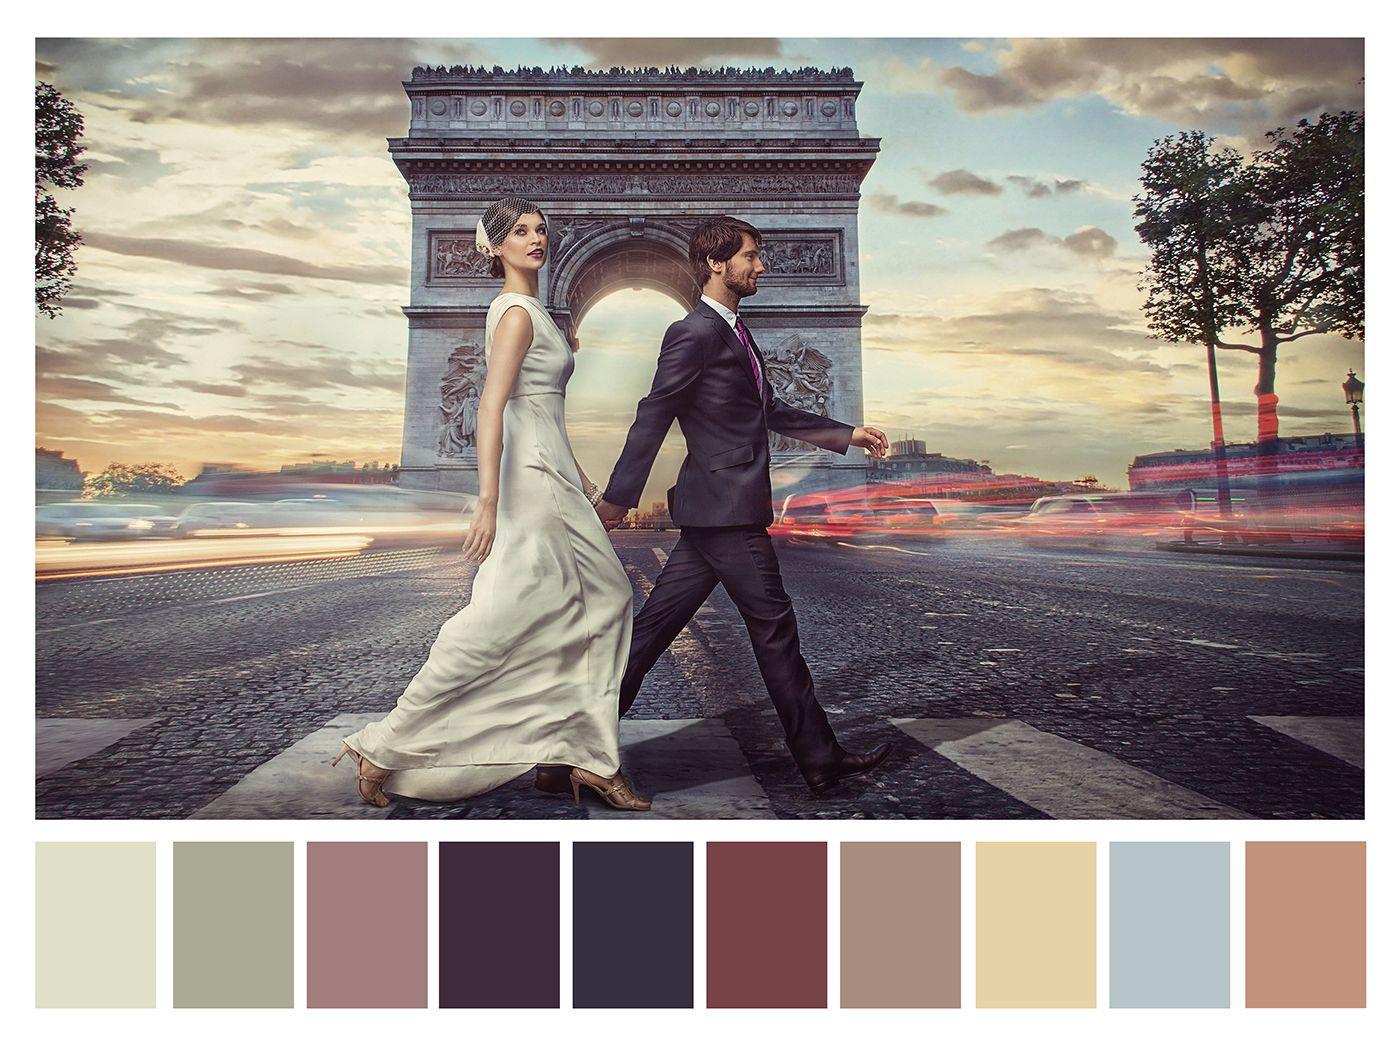 https://www.behance.net/gallery/42609487/Adobe-Color-My-Portfolio-Palettes